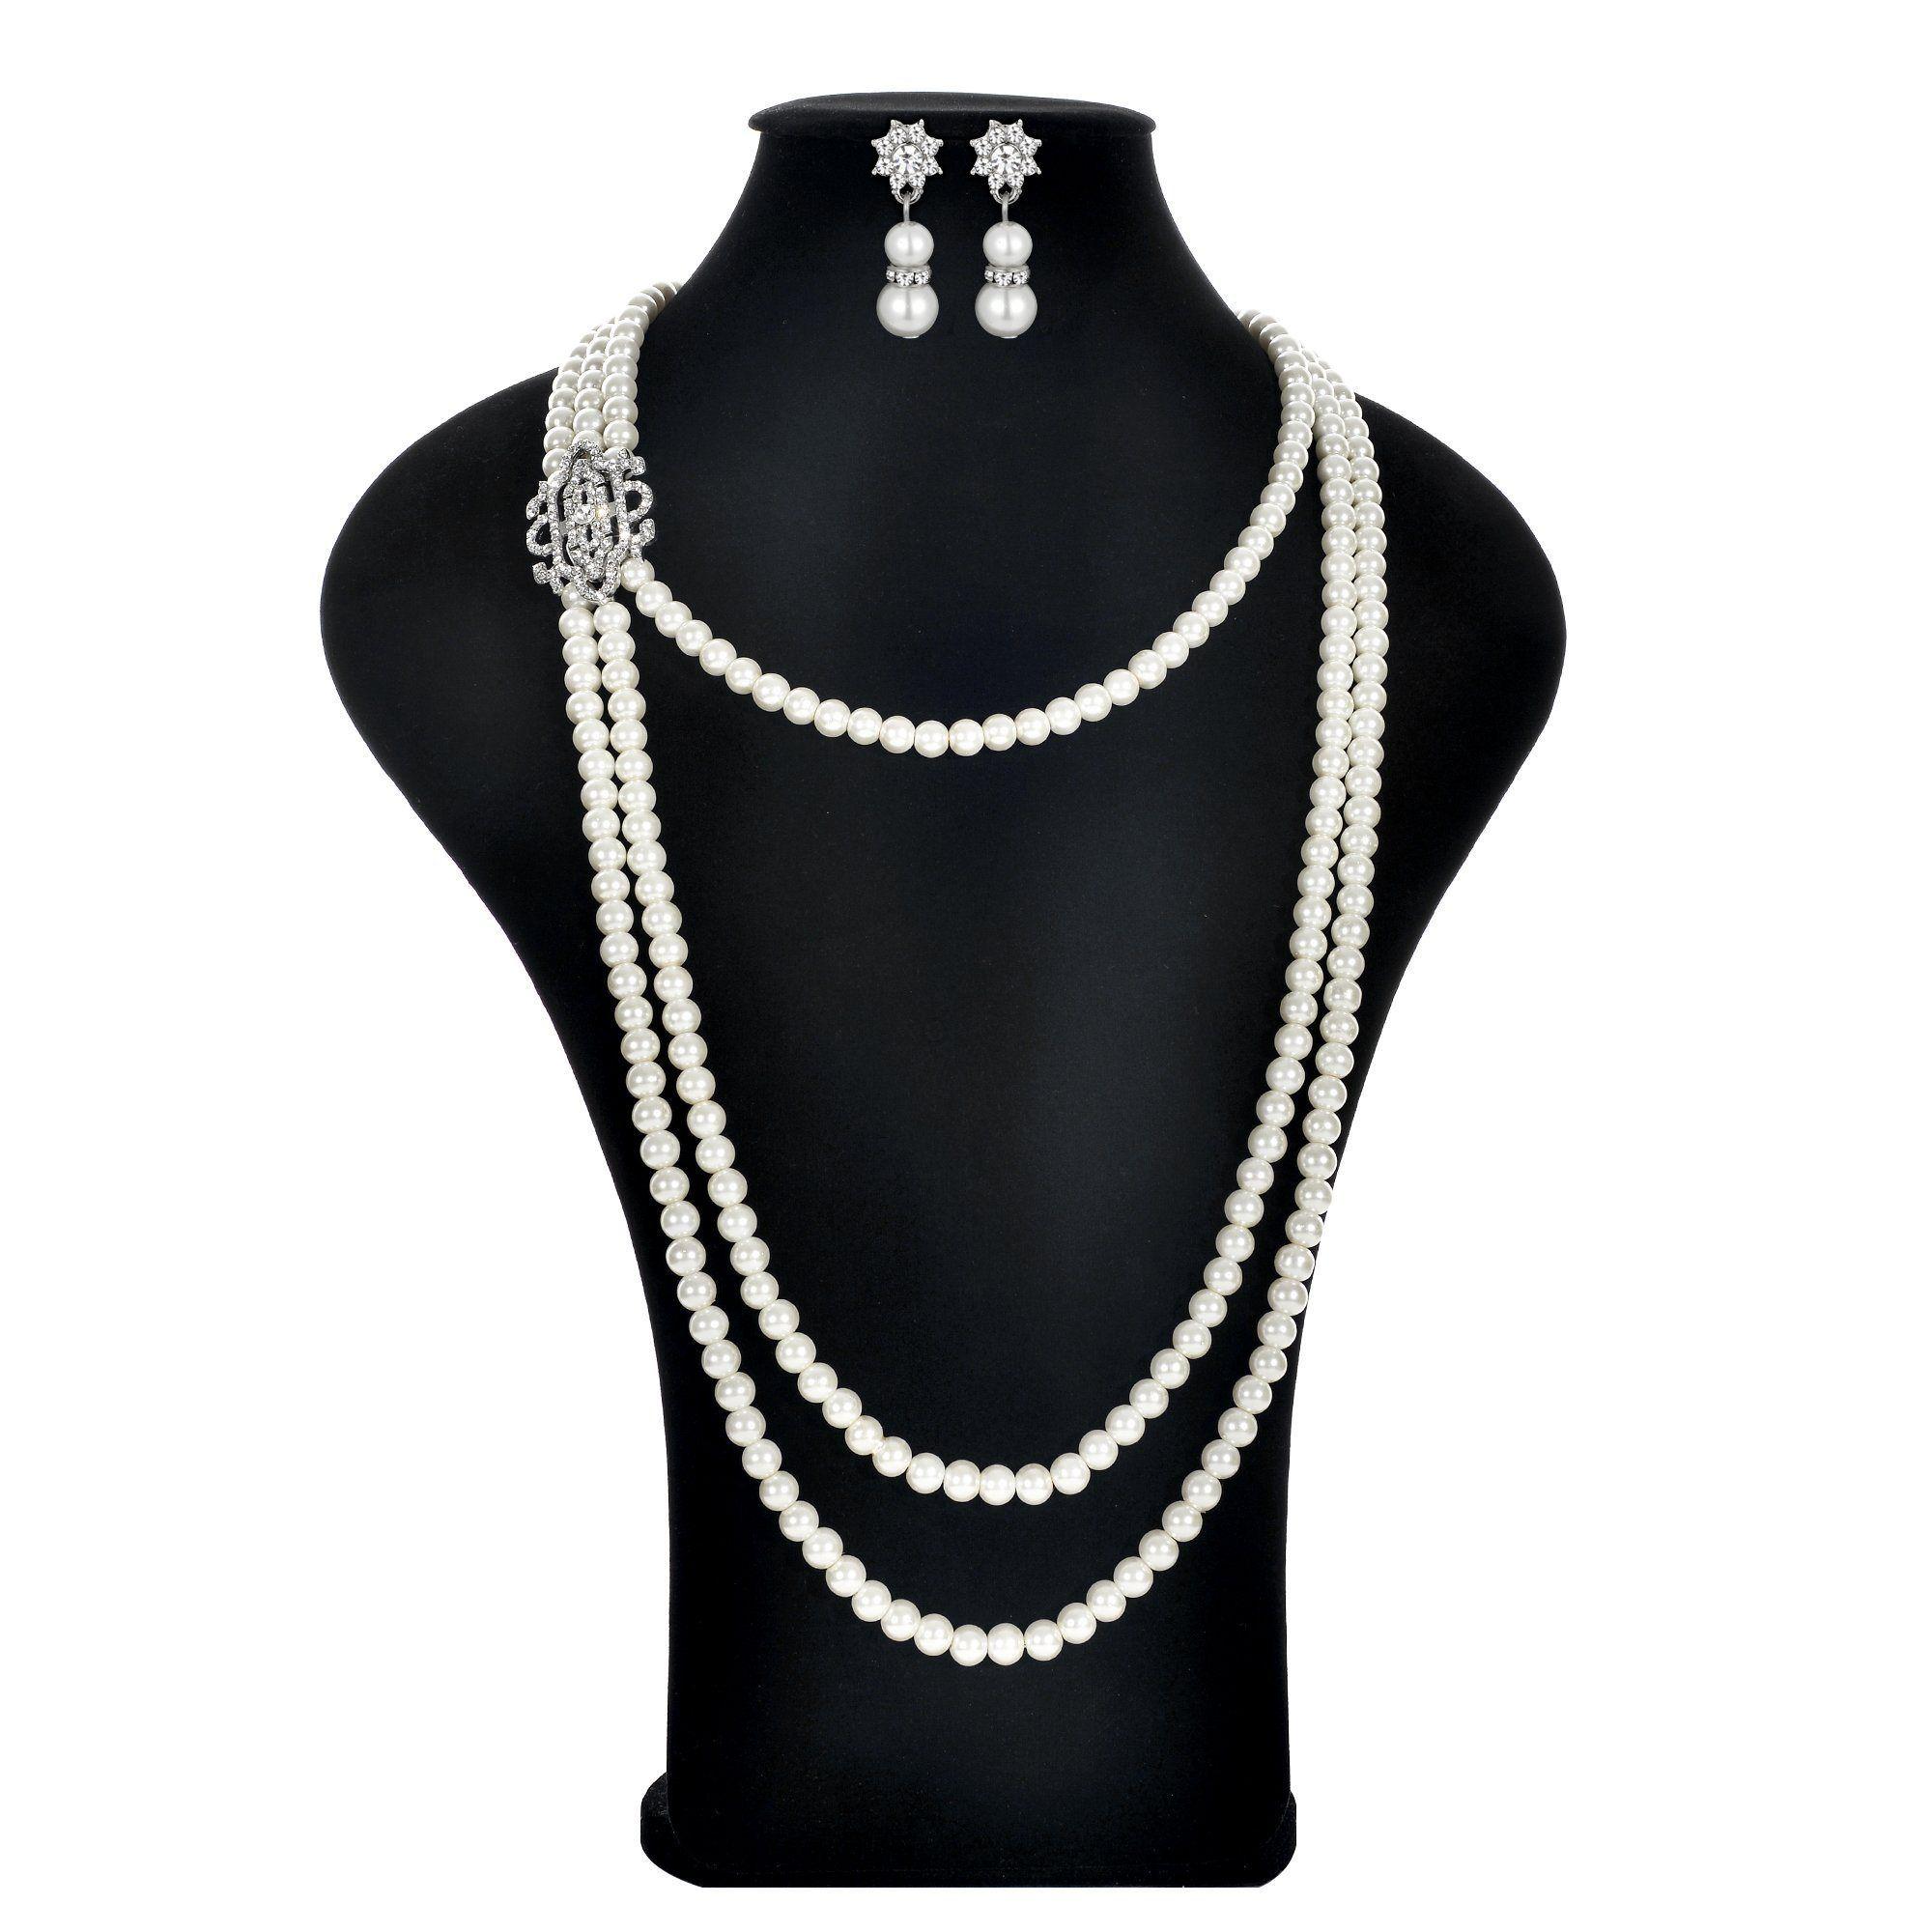 1920s Flapper Charleston Pearl Choker Necklace Fancy Dress Gatsby Accessory New